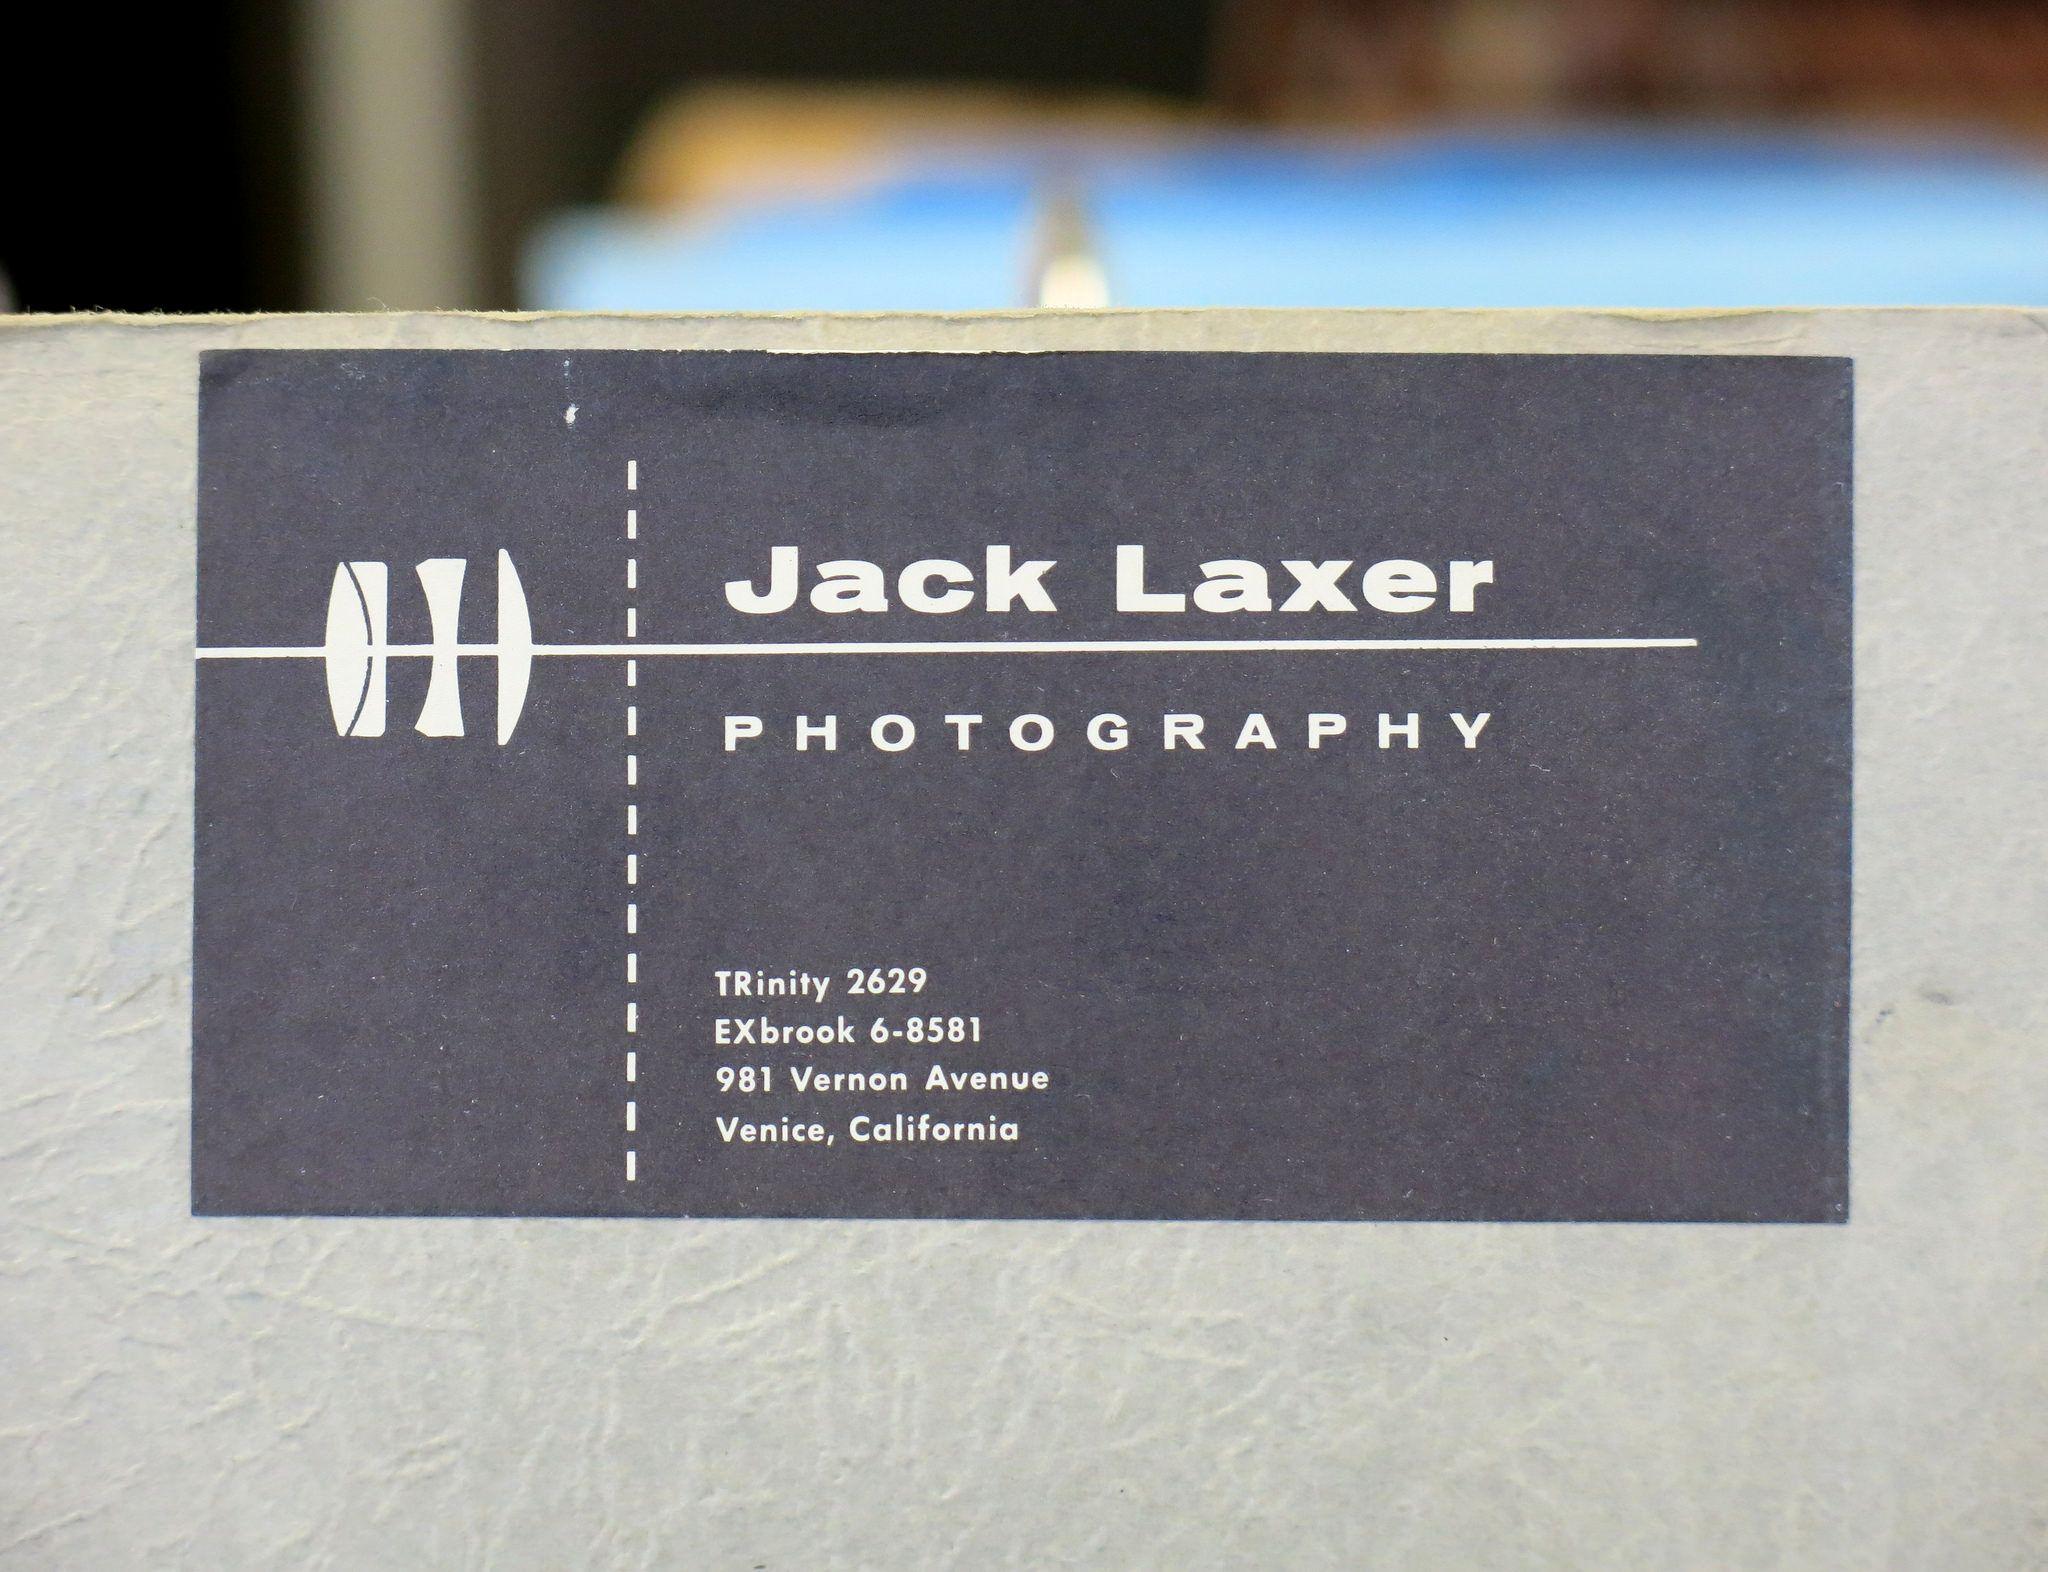 JACK LAXER - Photographer - Business Card